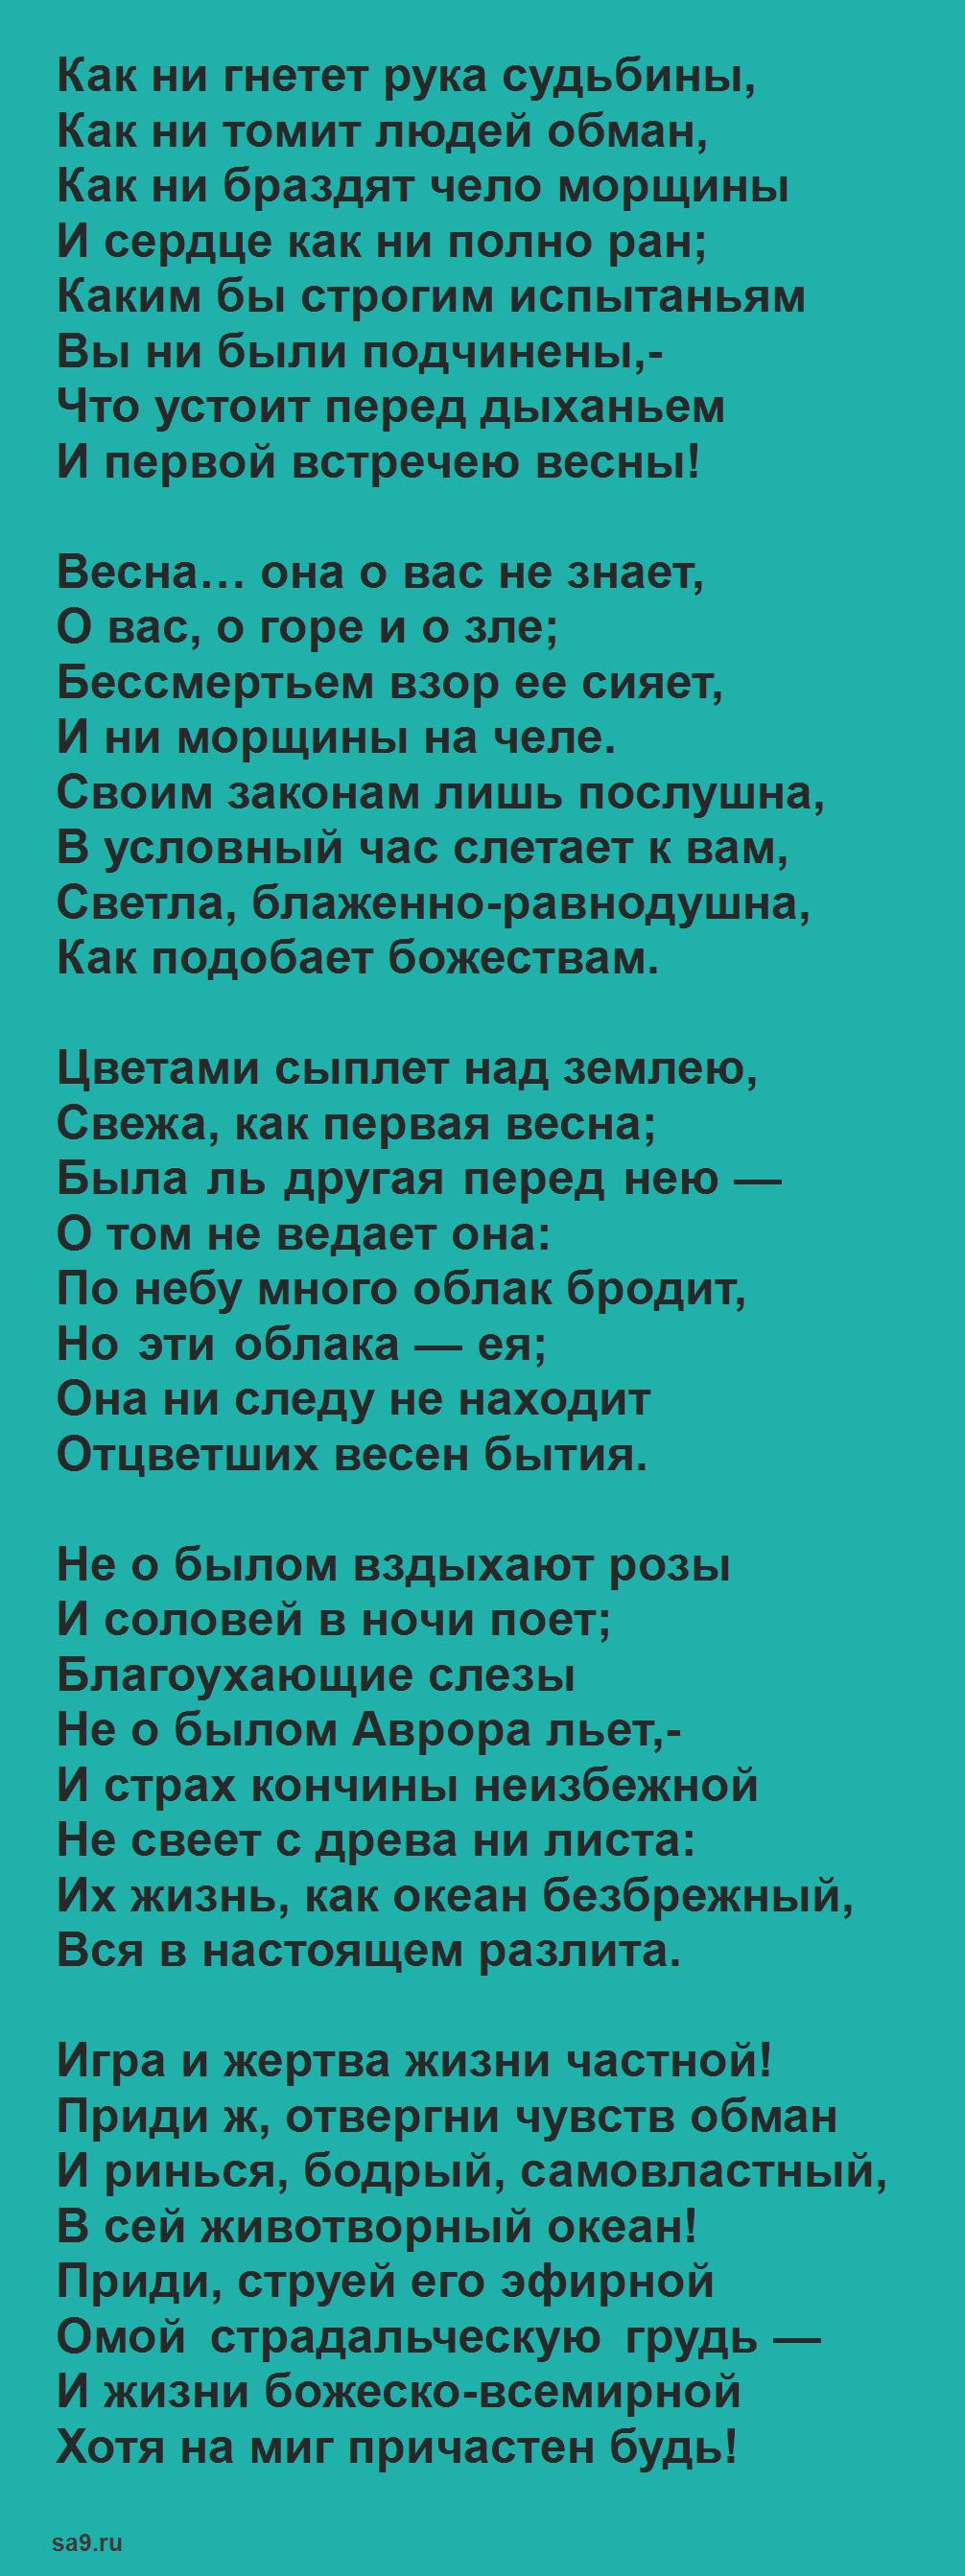 Стихи Тютчева о весне - Весна